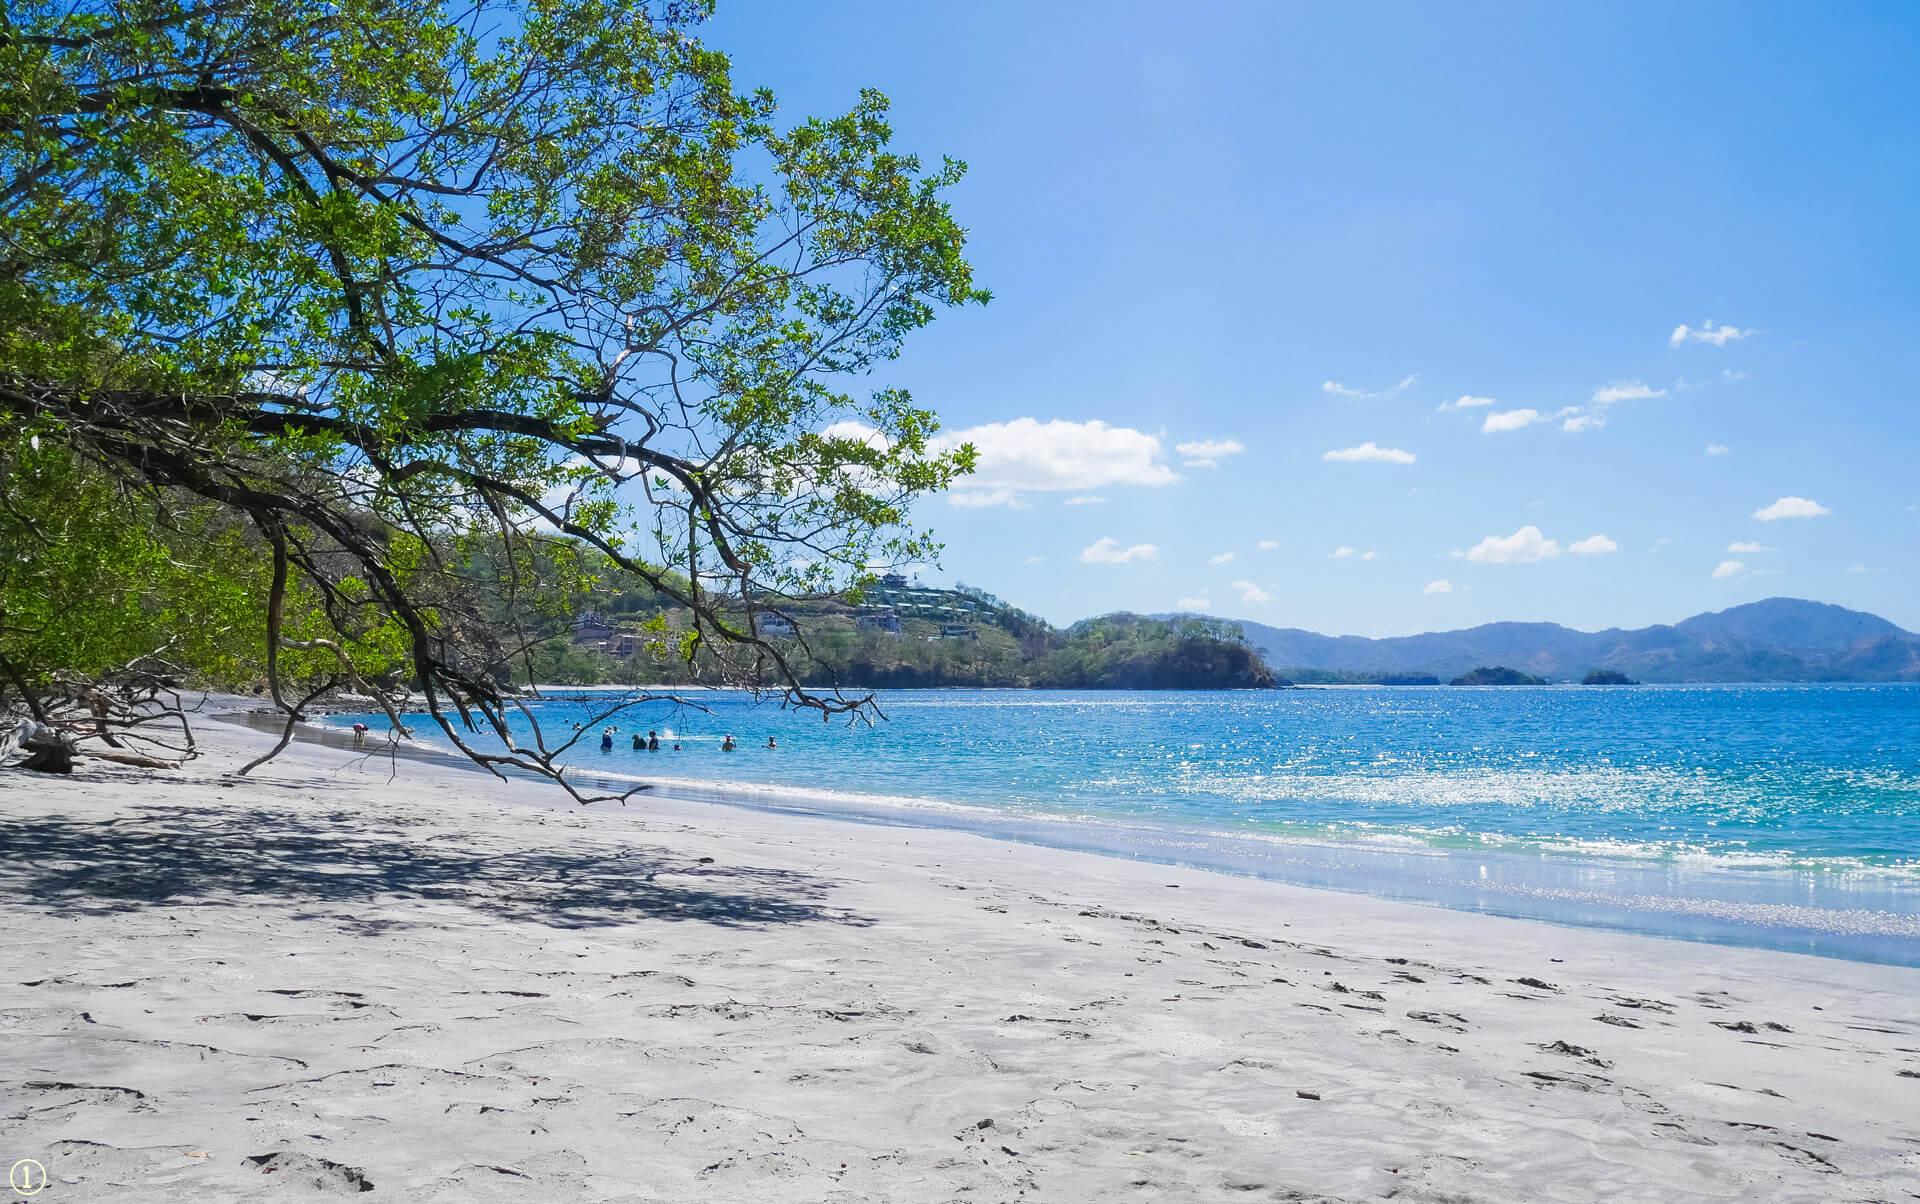 playa dantita beach guanacaste costa rica